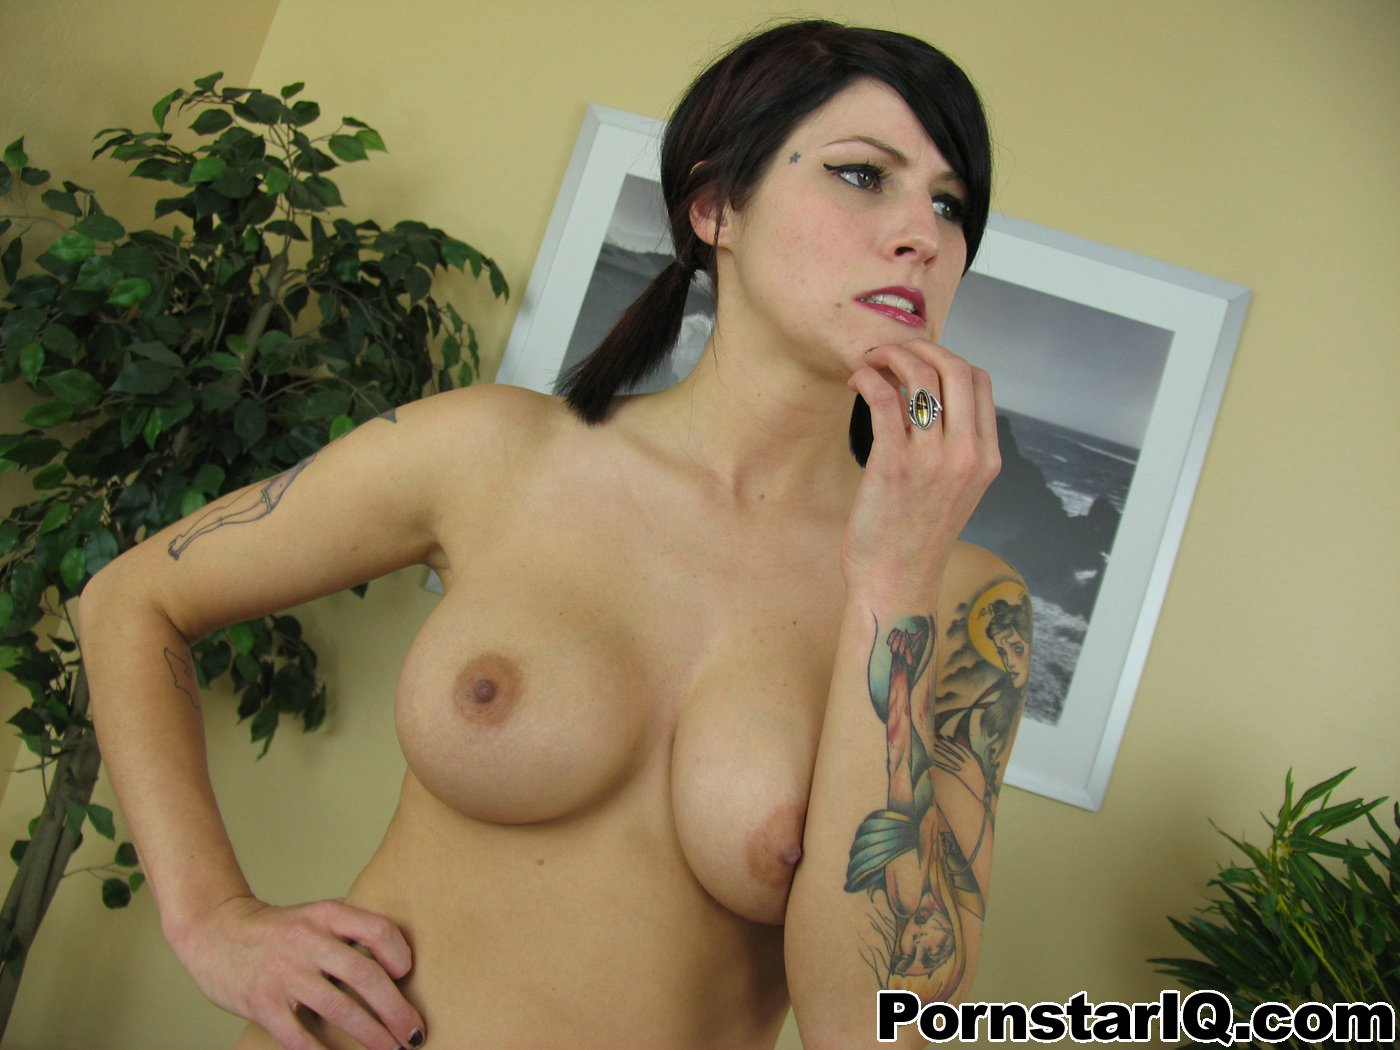 Michelle trachtenberg nude scenes